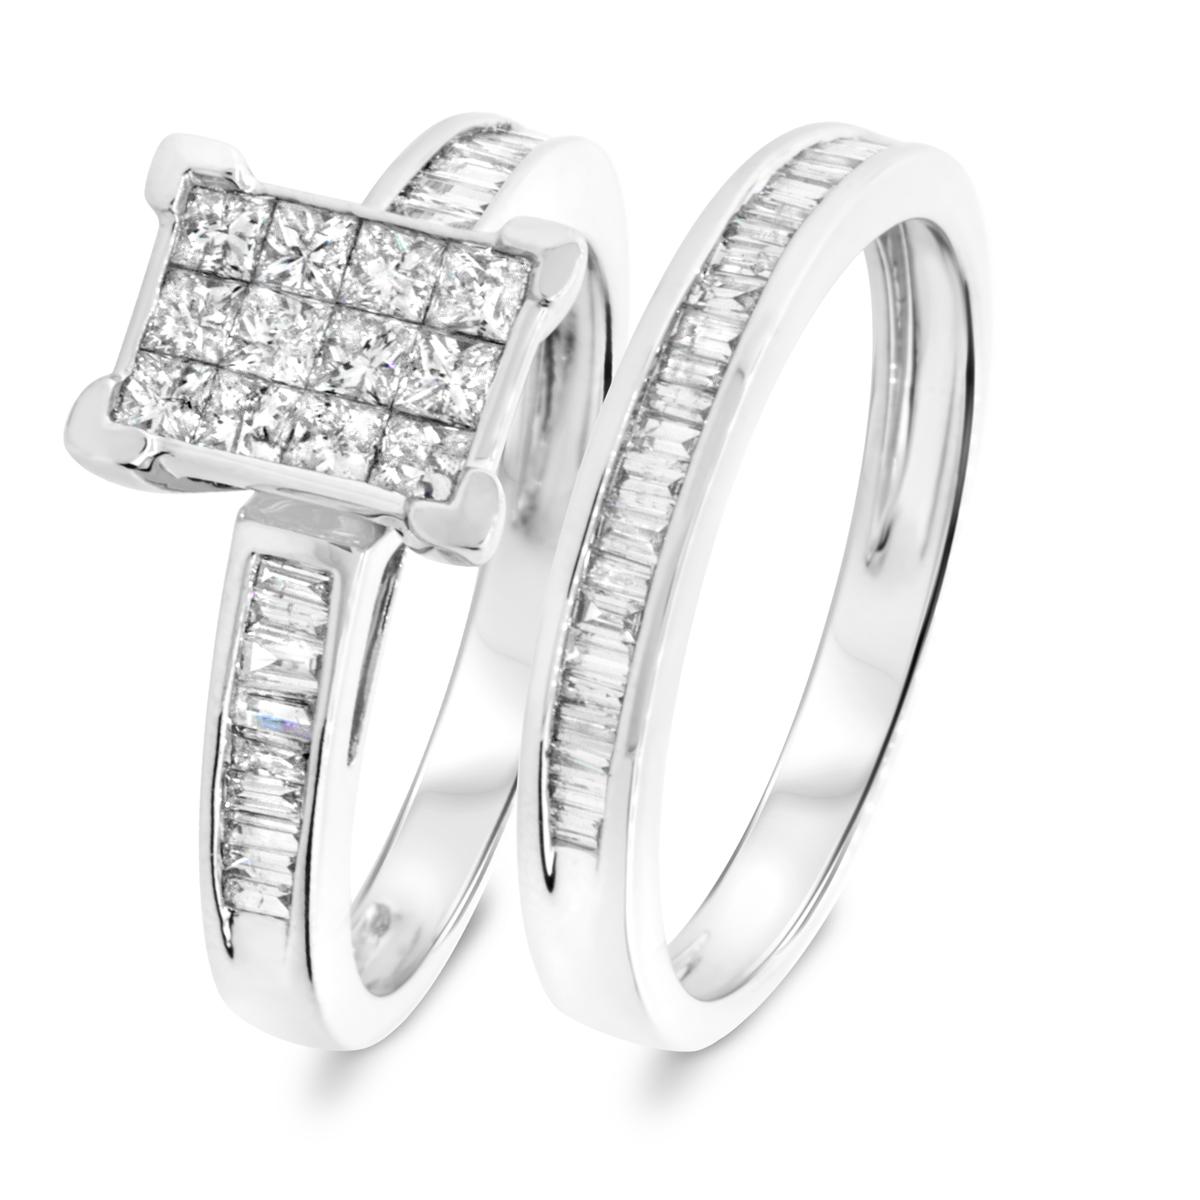 1 1/10 CT. T.W. Princess, Baguette Cut Diamond Ladies Bridal Wedding Ring Set